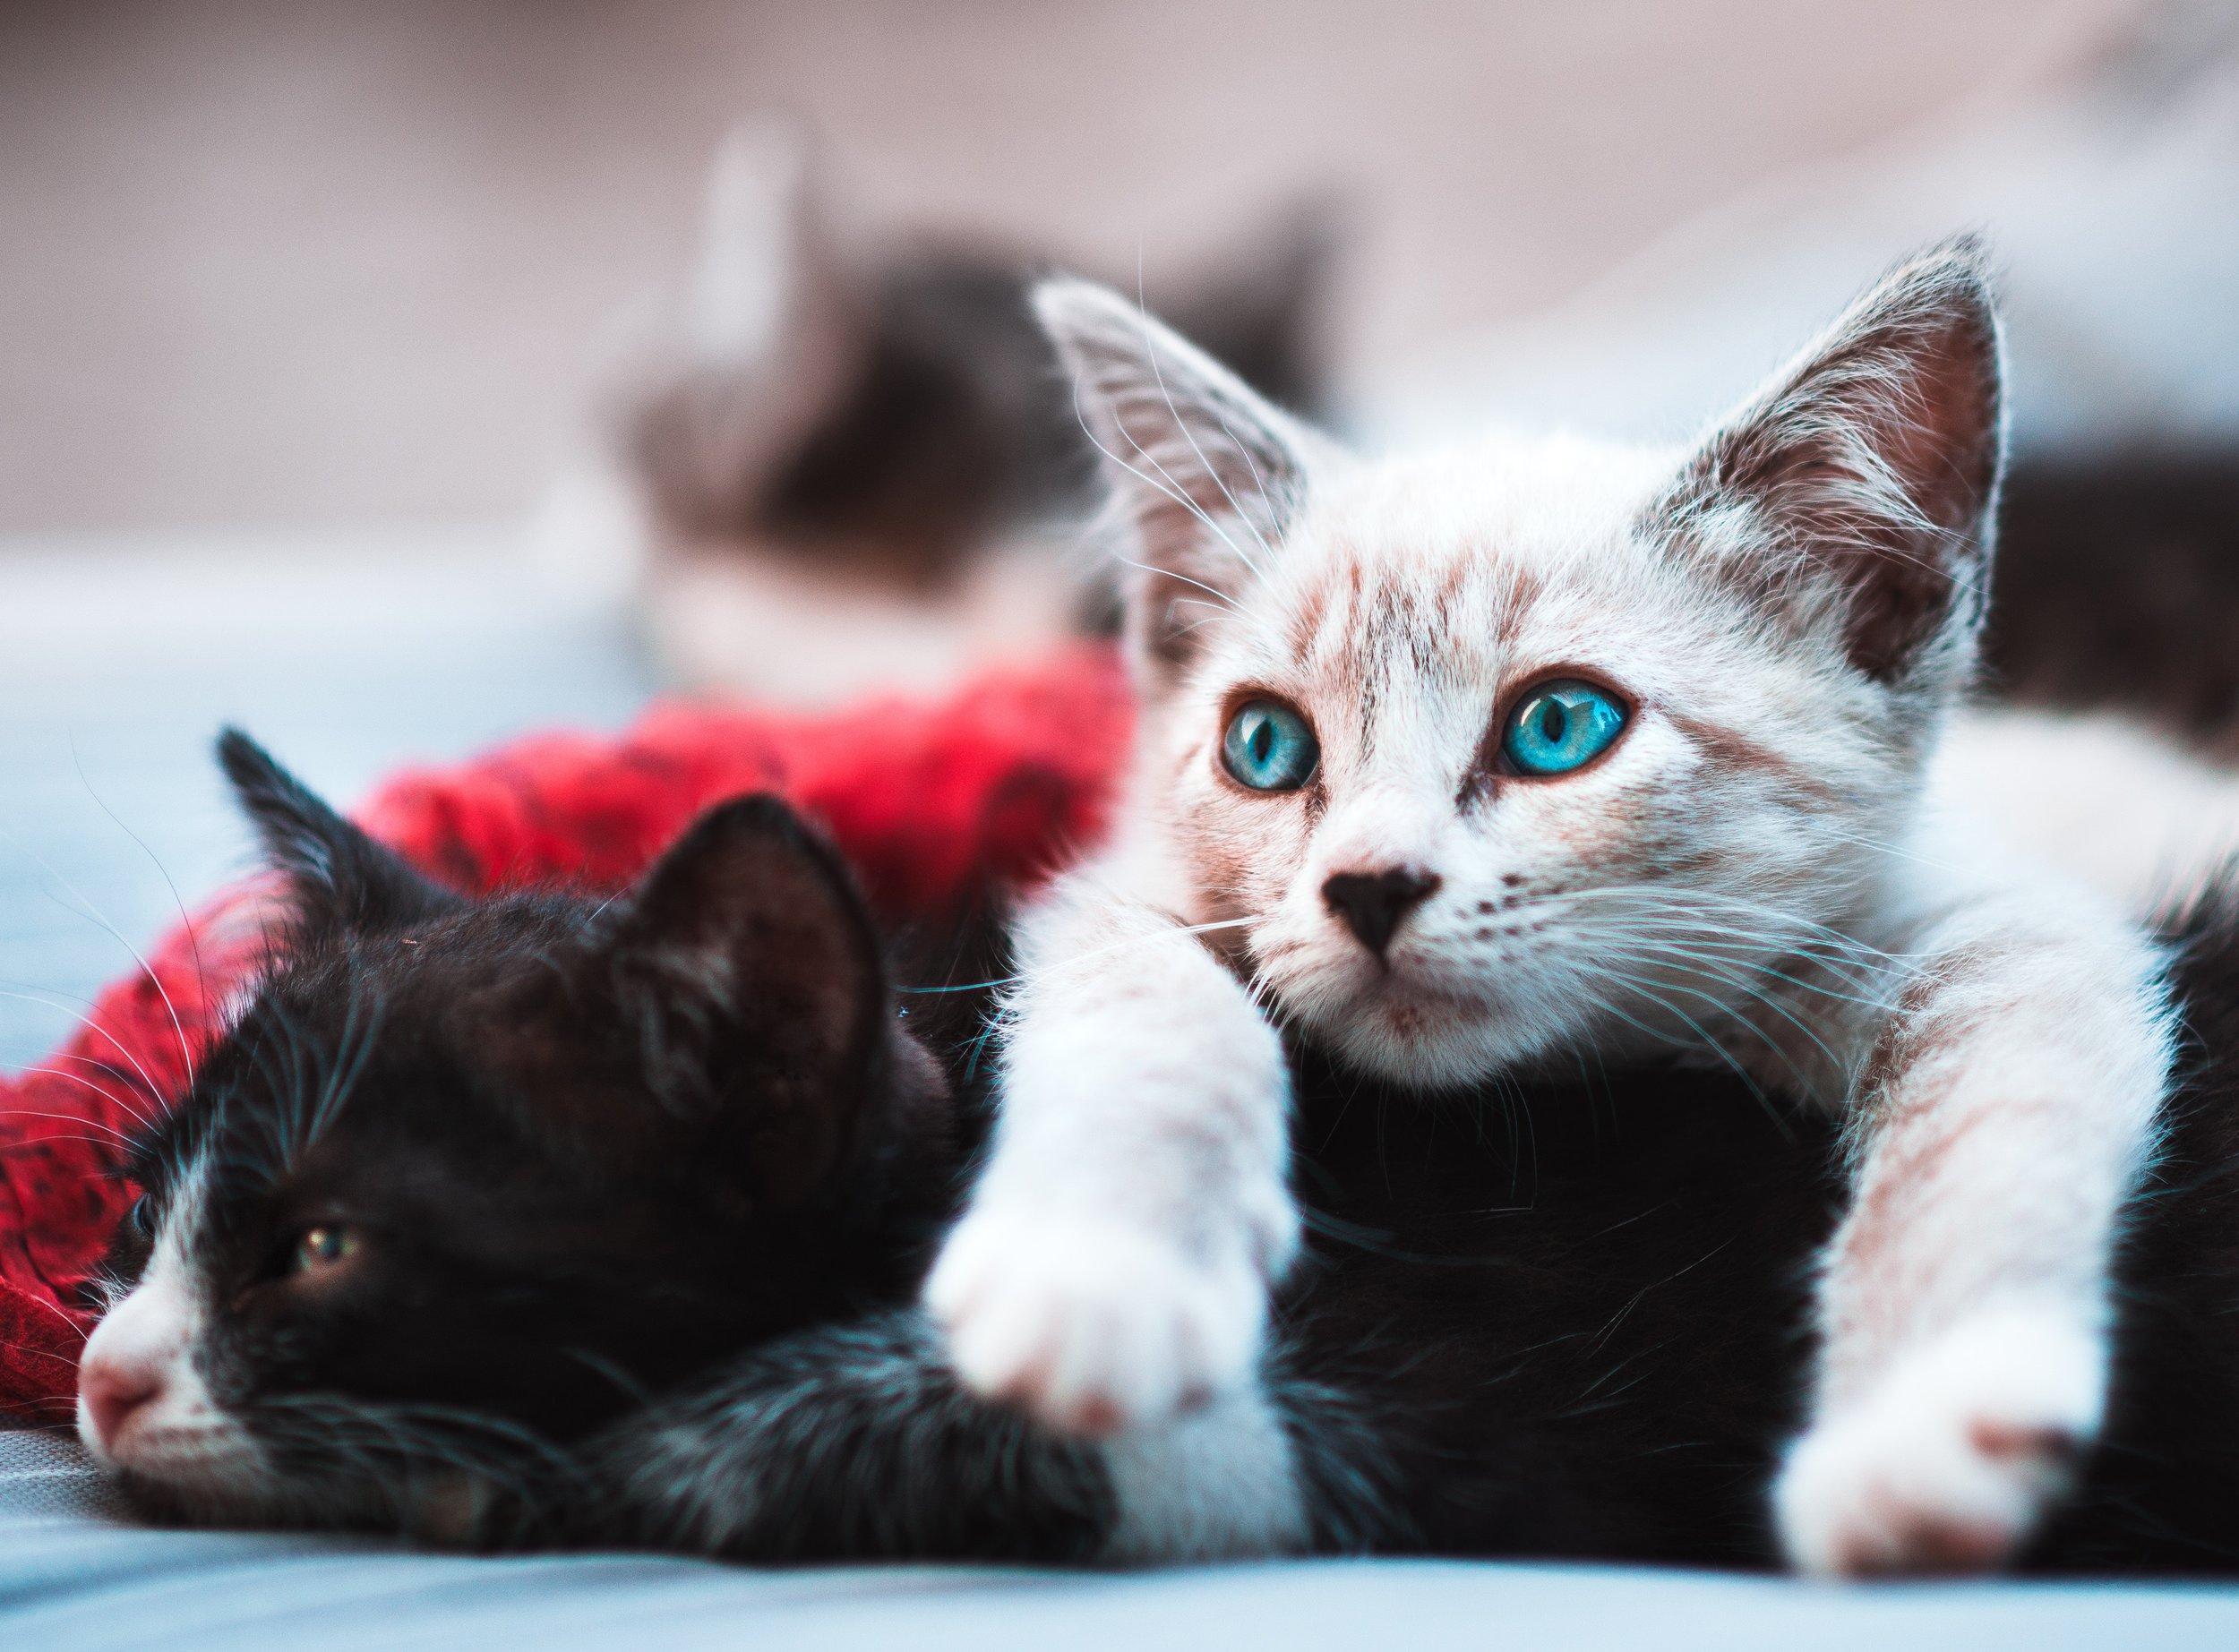 Black and White Kittens, #kittens #cutekittens #kittenadoption